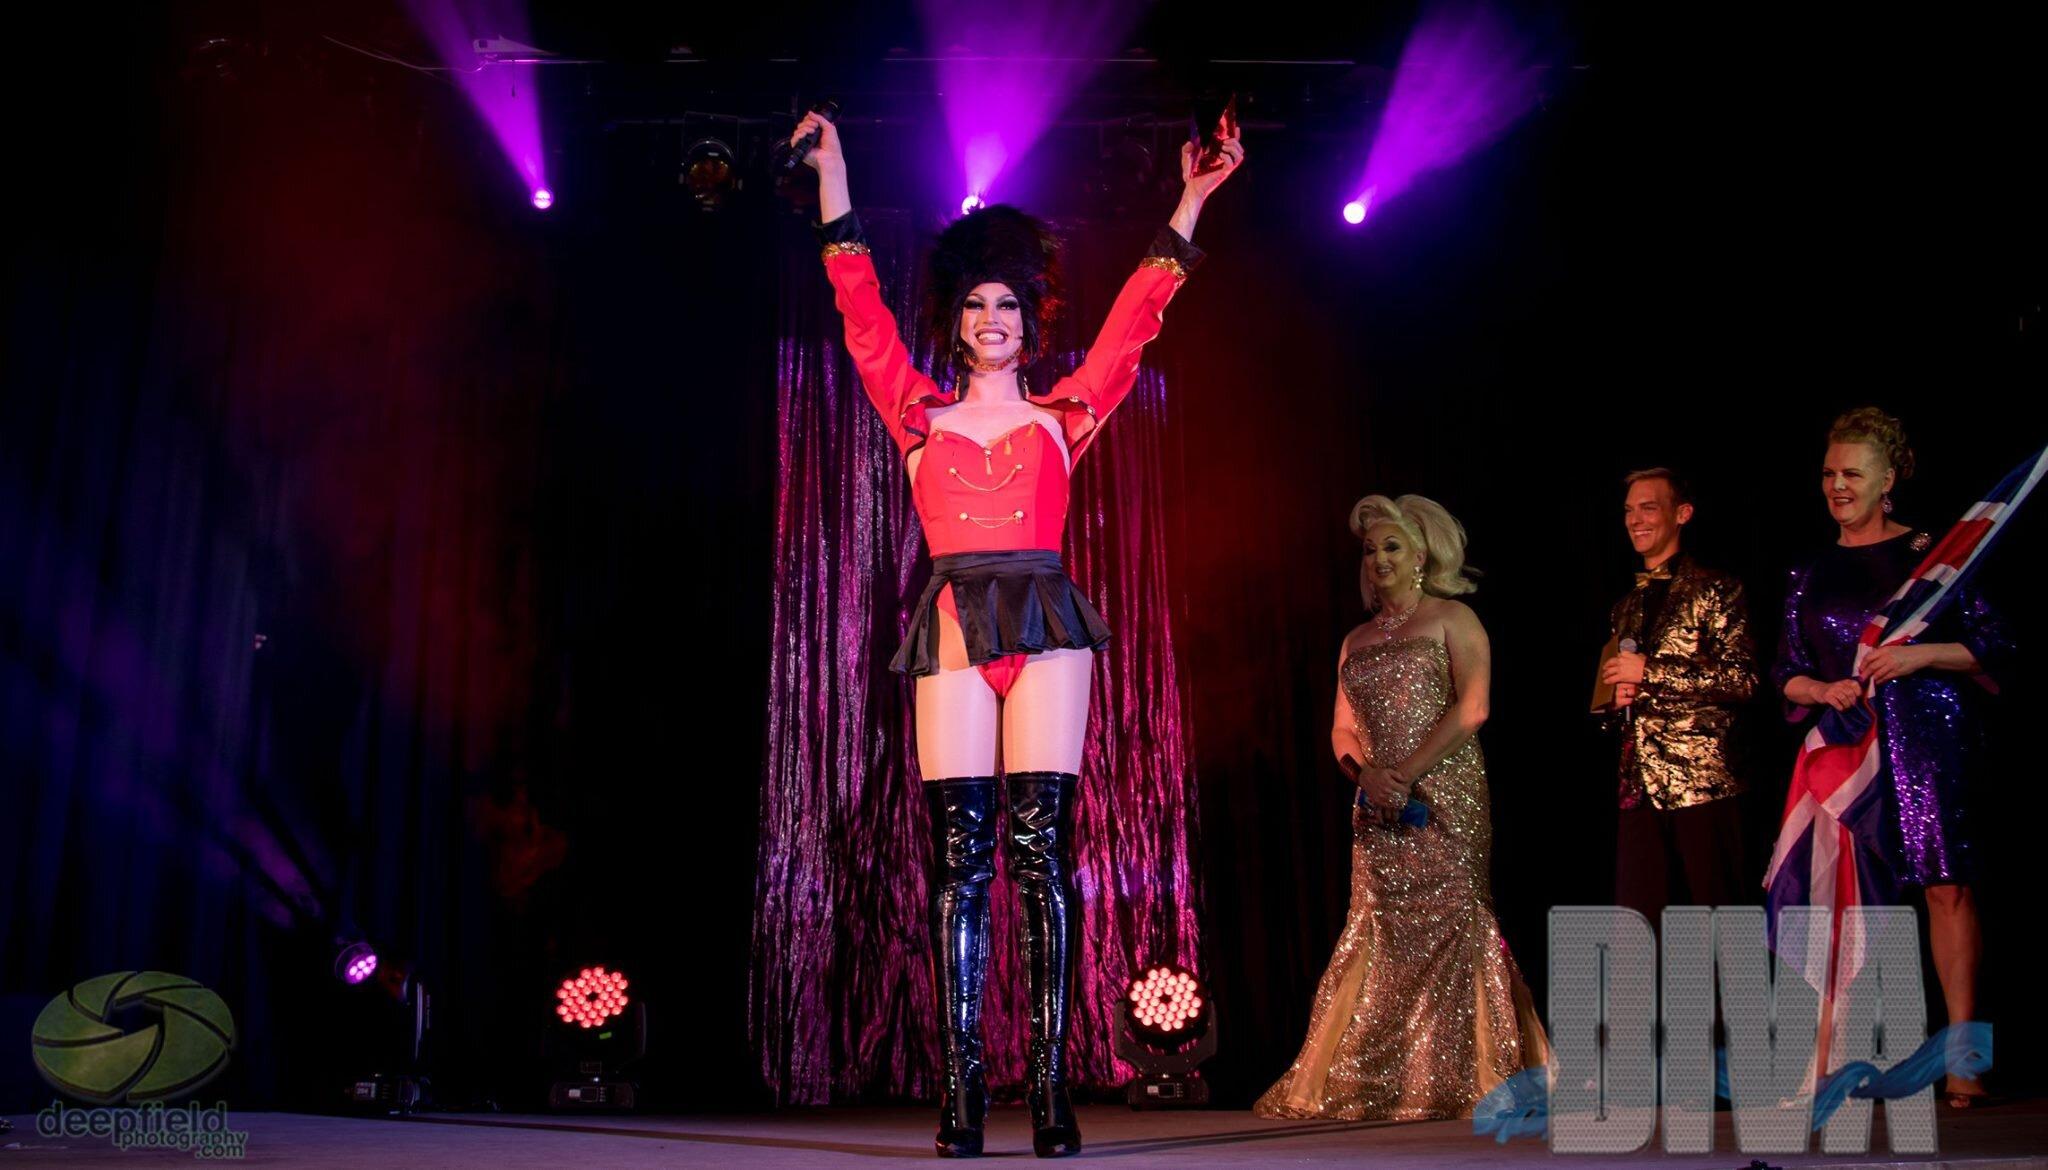 sia-tequila-winner-win-entertainer-of-the-year-diva-awards-sydney-drag-queen-royalty-best-hire-drag-race-australia-4.jpg